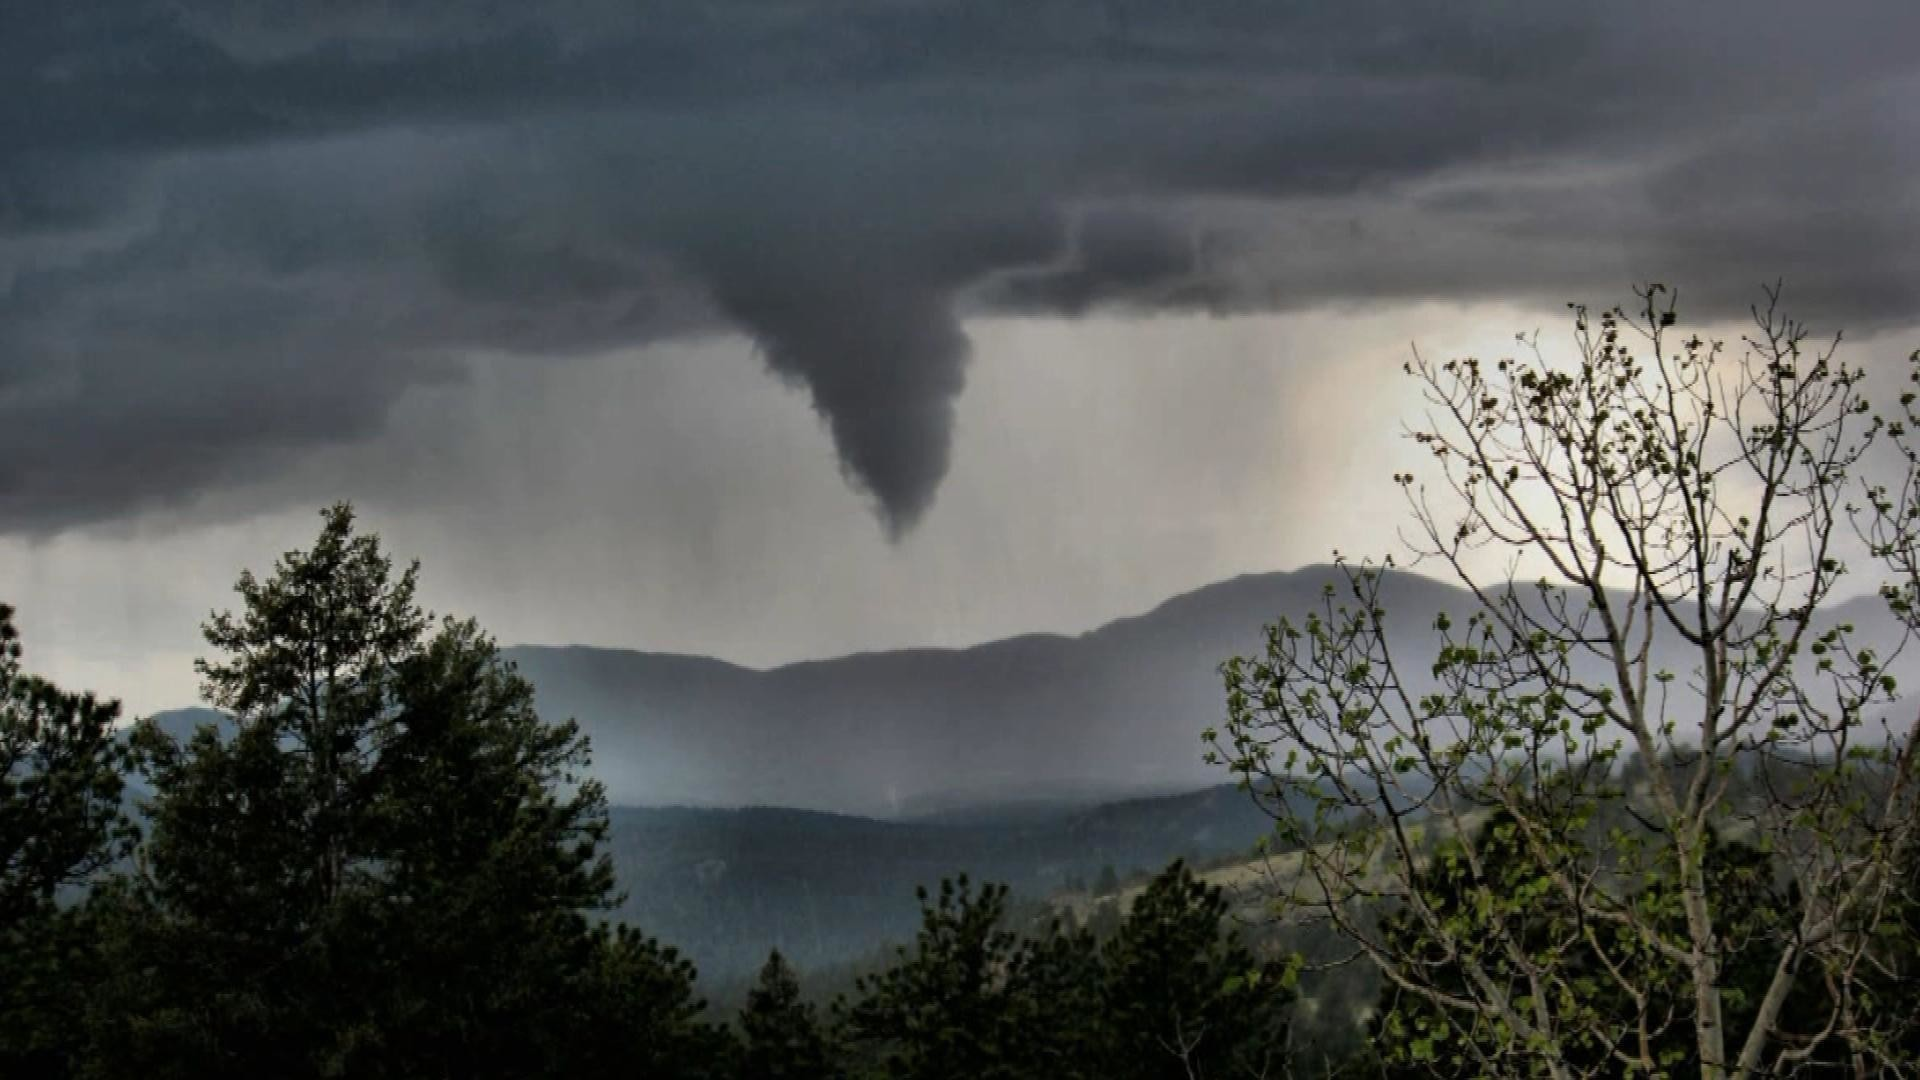 cool tornado storm rain disaster nature sky hd background wallpaper